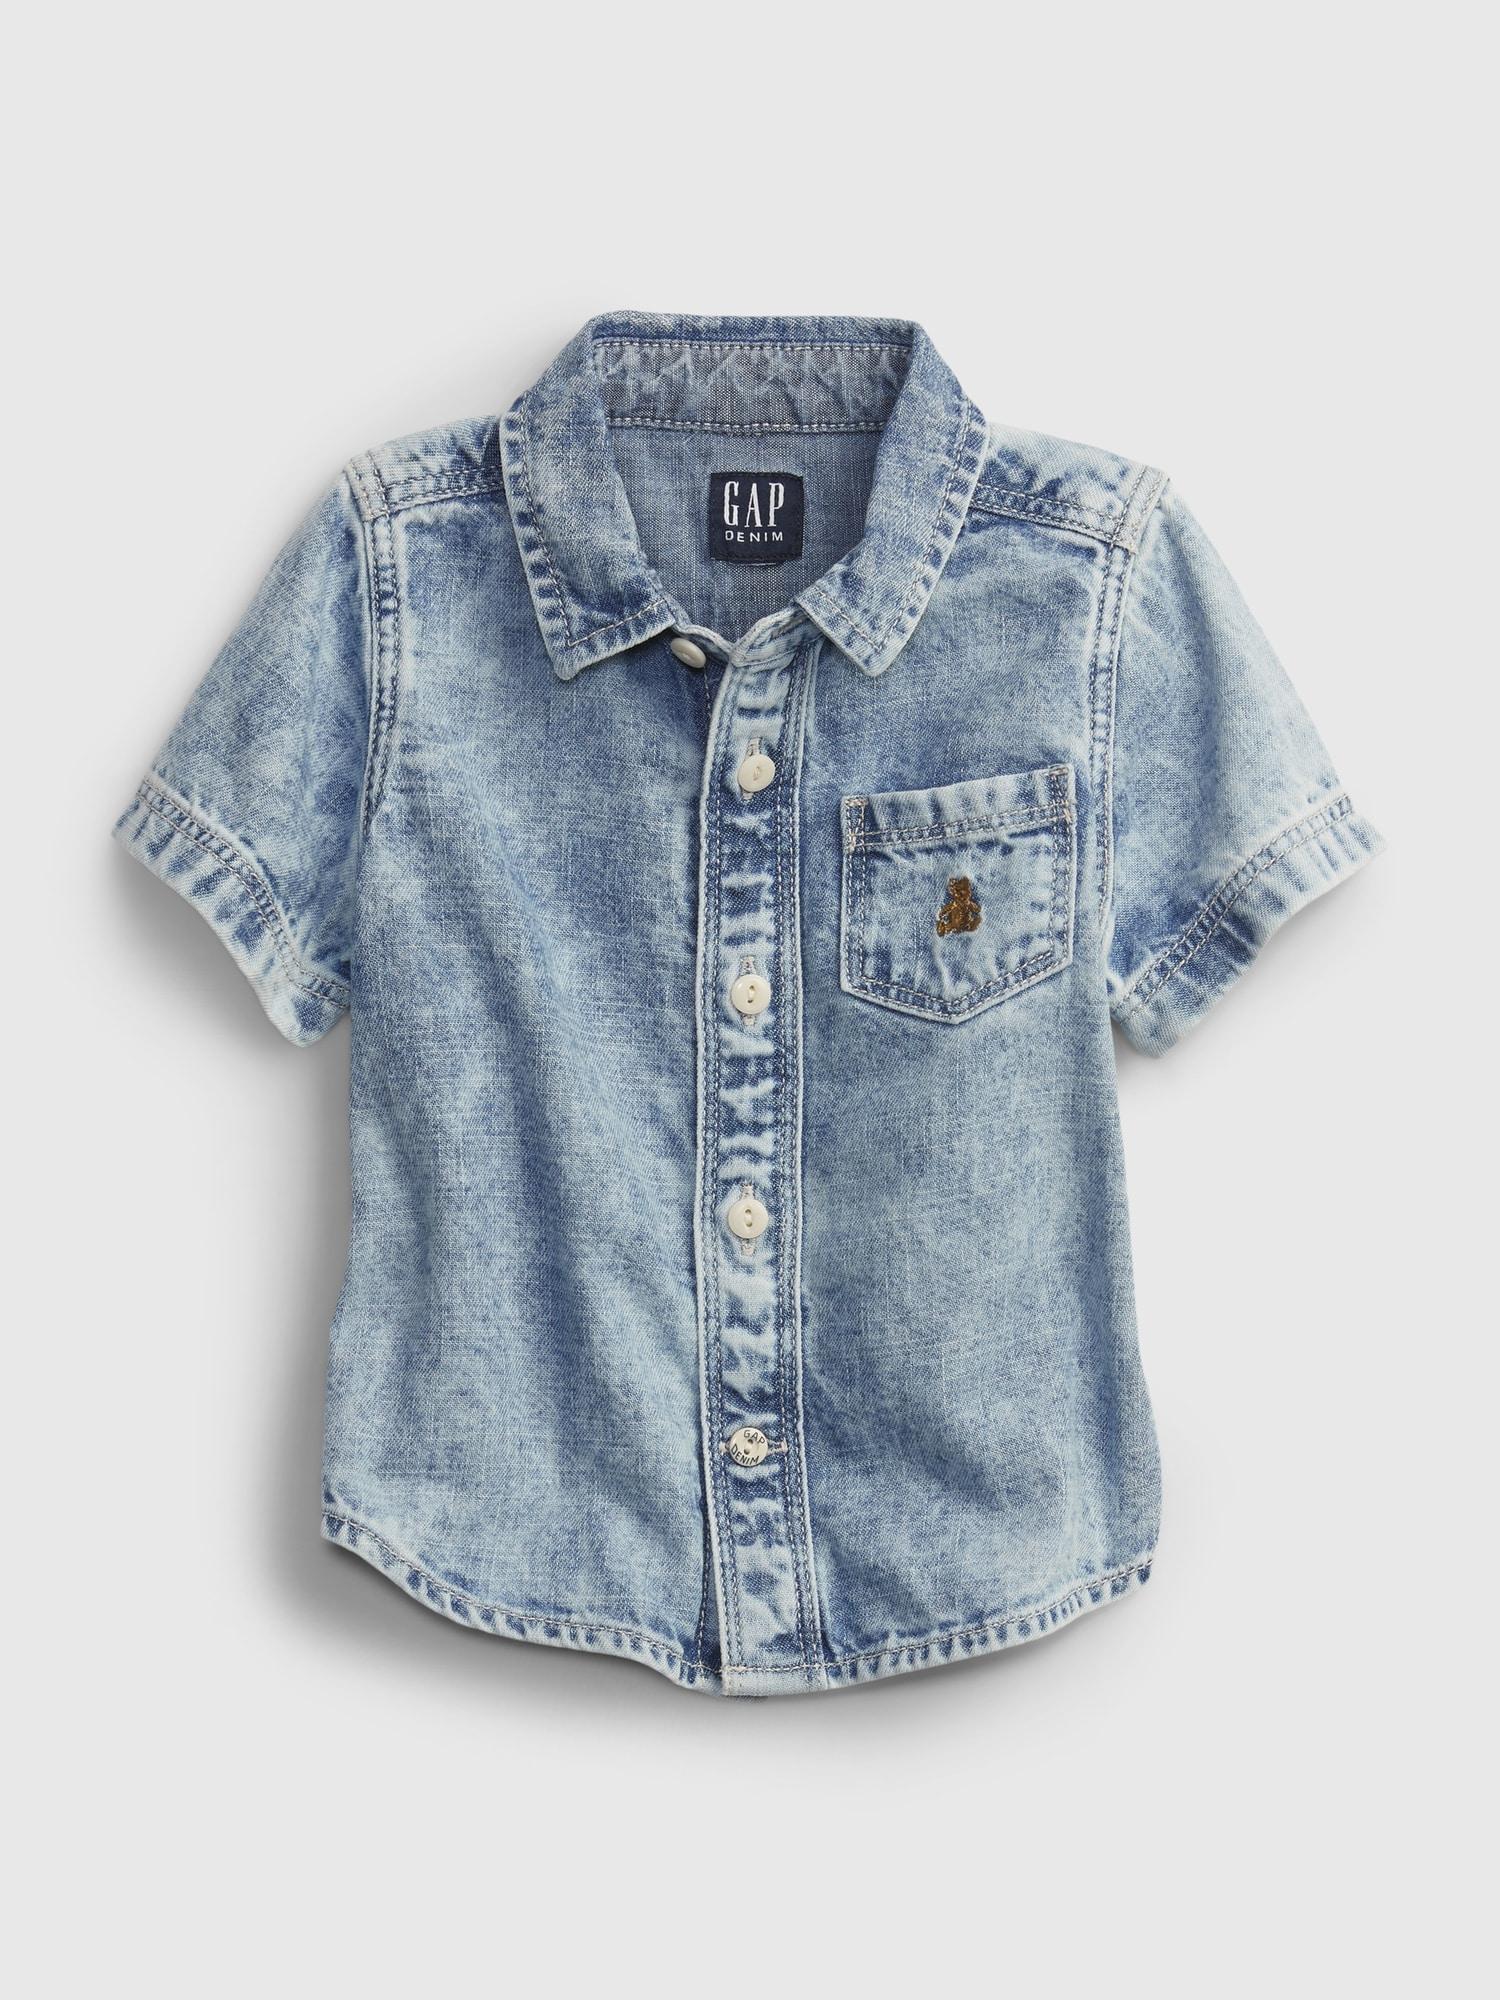 Baby デニム タンブルシャツ (ベビー)